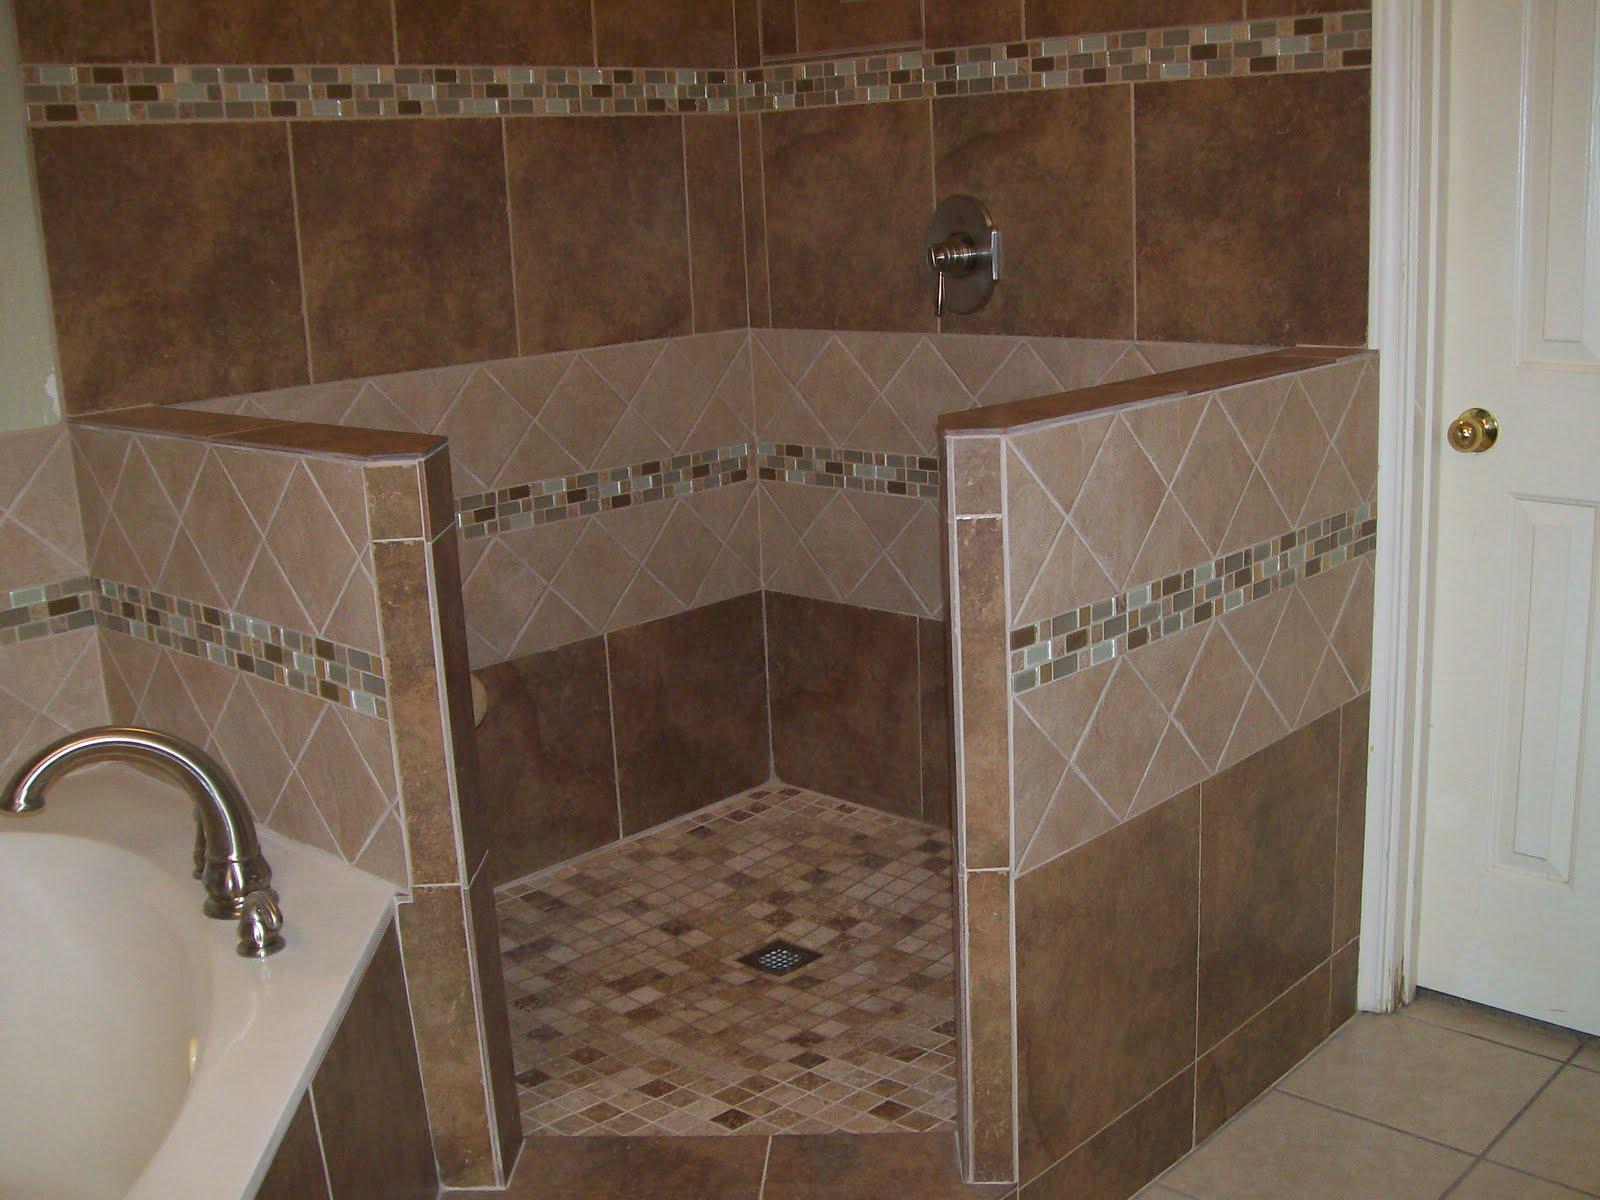 gemini bathroom remodeling: hart job in keller